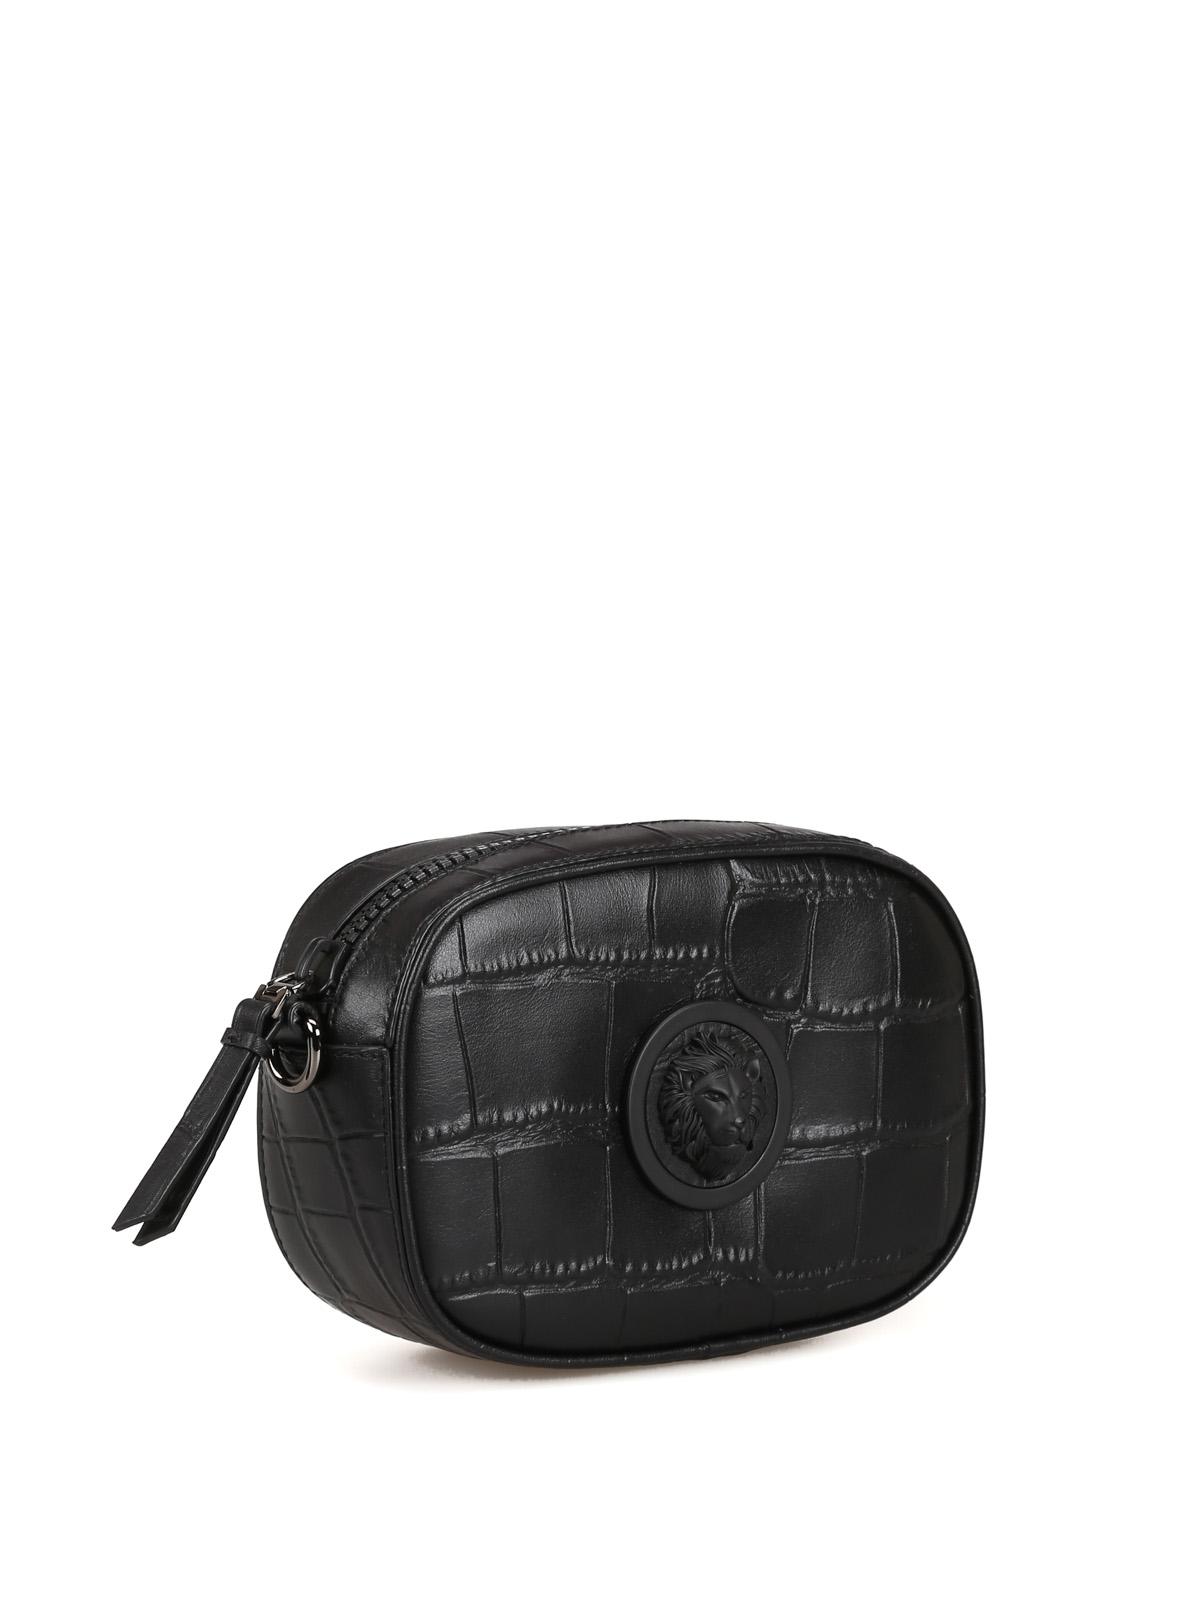 fae3cbe5 Versus Versace - Lion Head printed leather camera bag - cross body ...